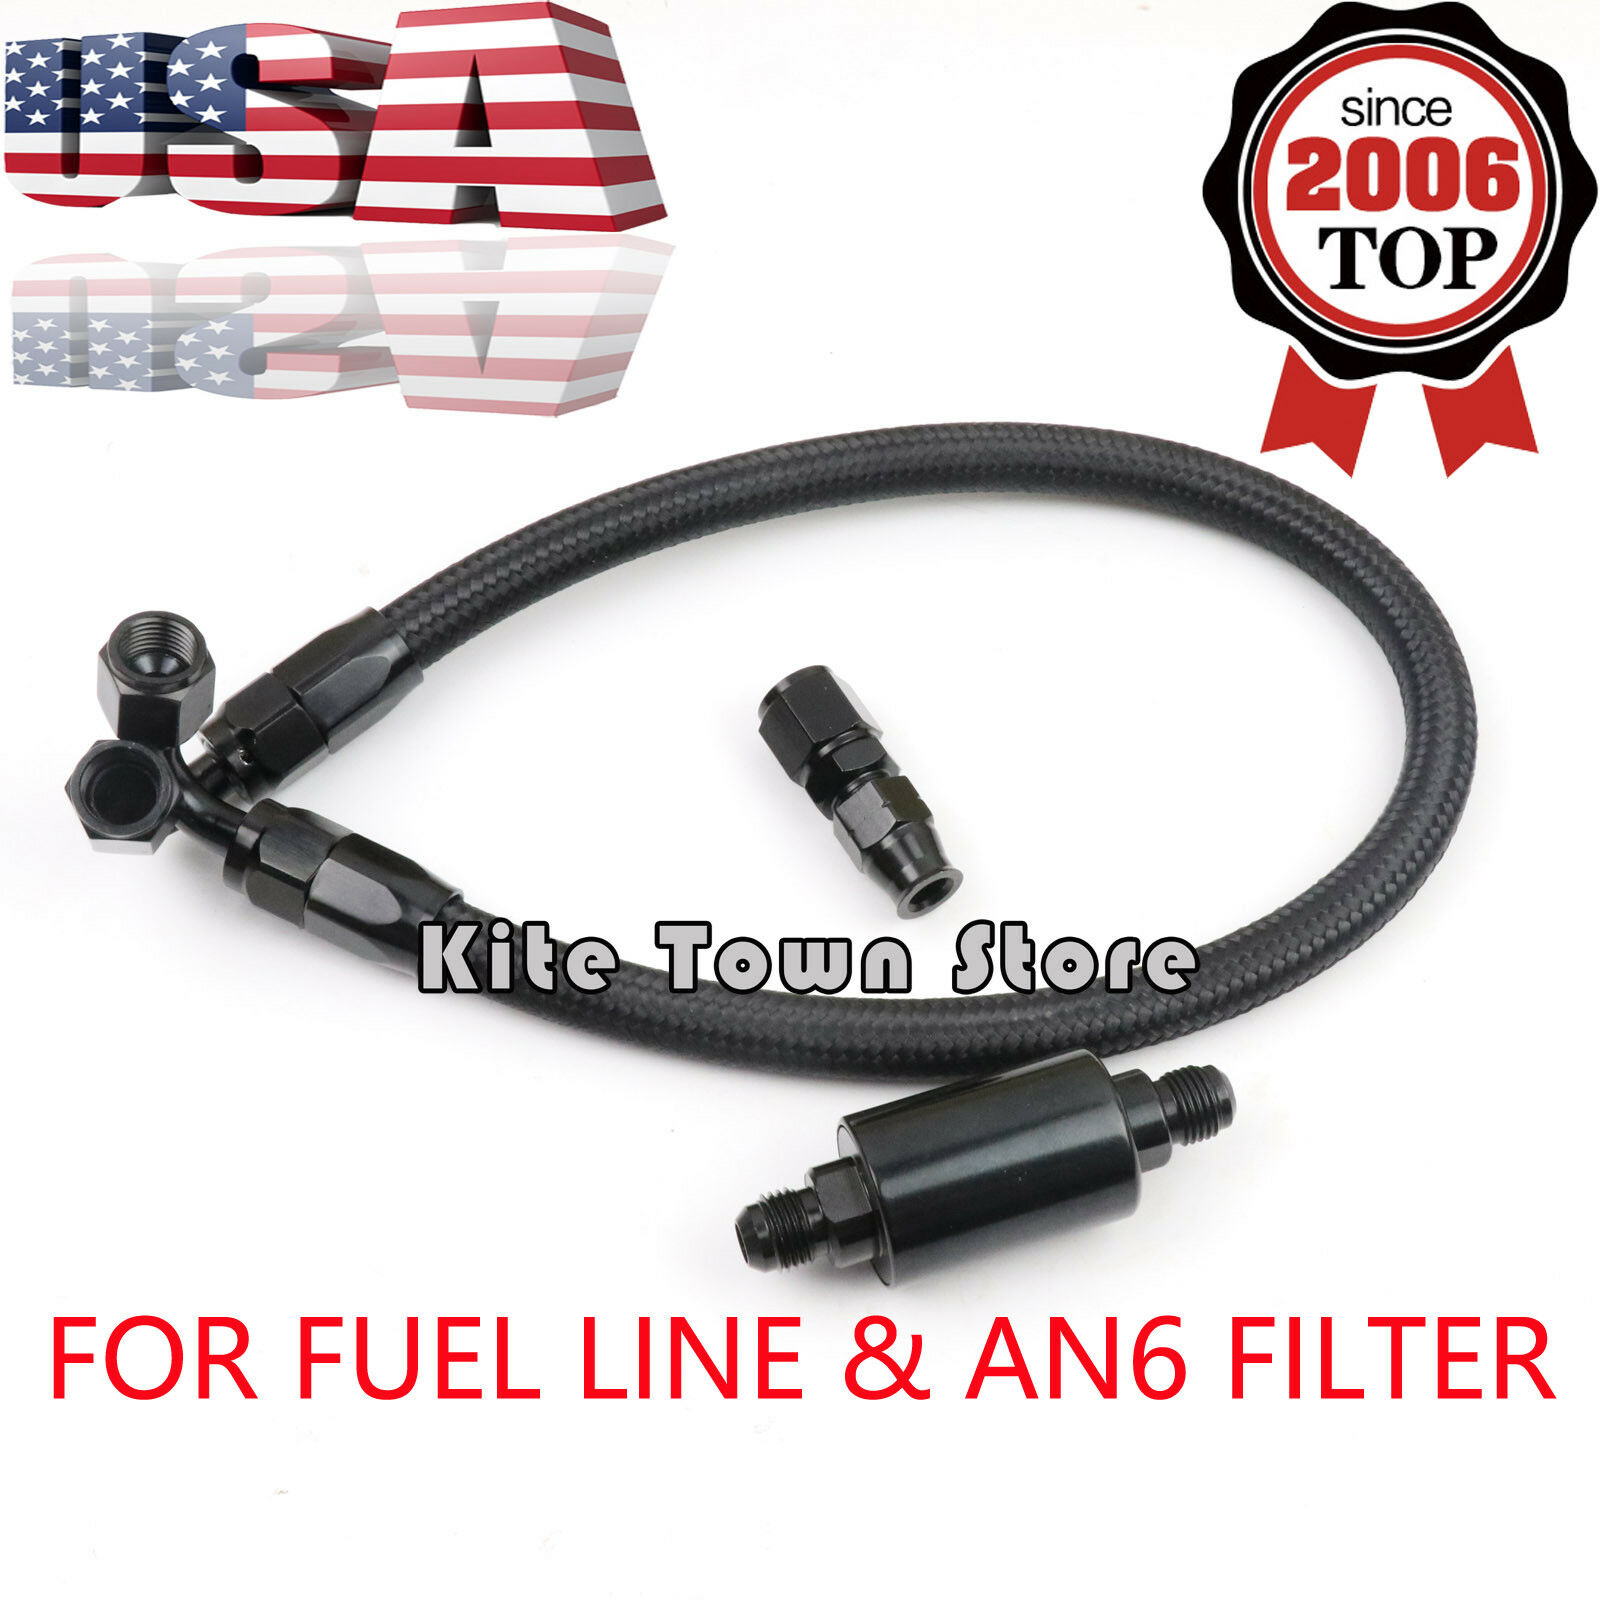 Fuel Line An6 Filter For Honda Civic Integra B/d Series